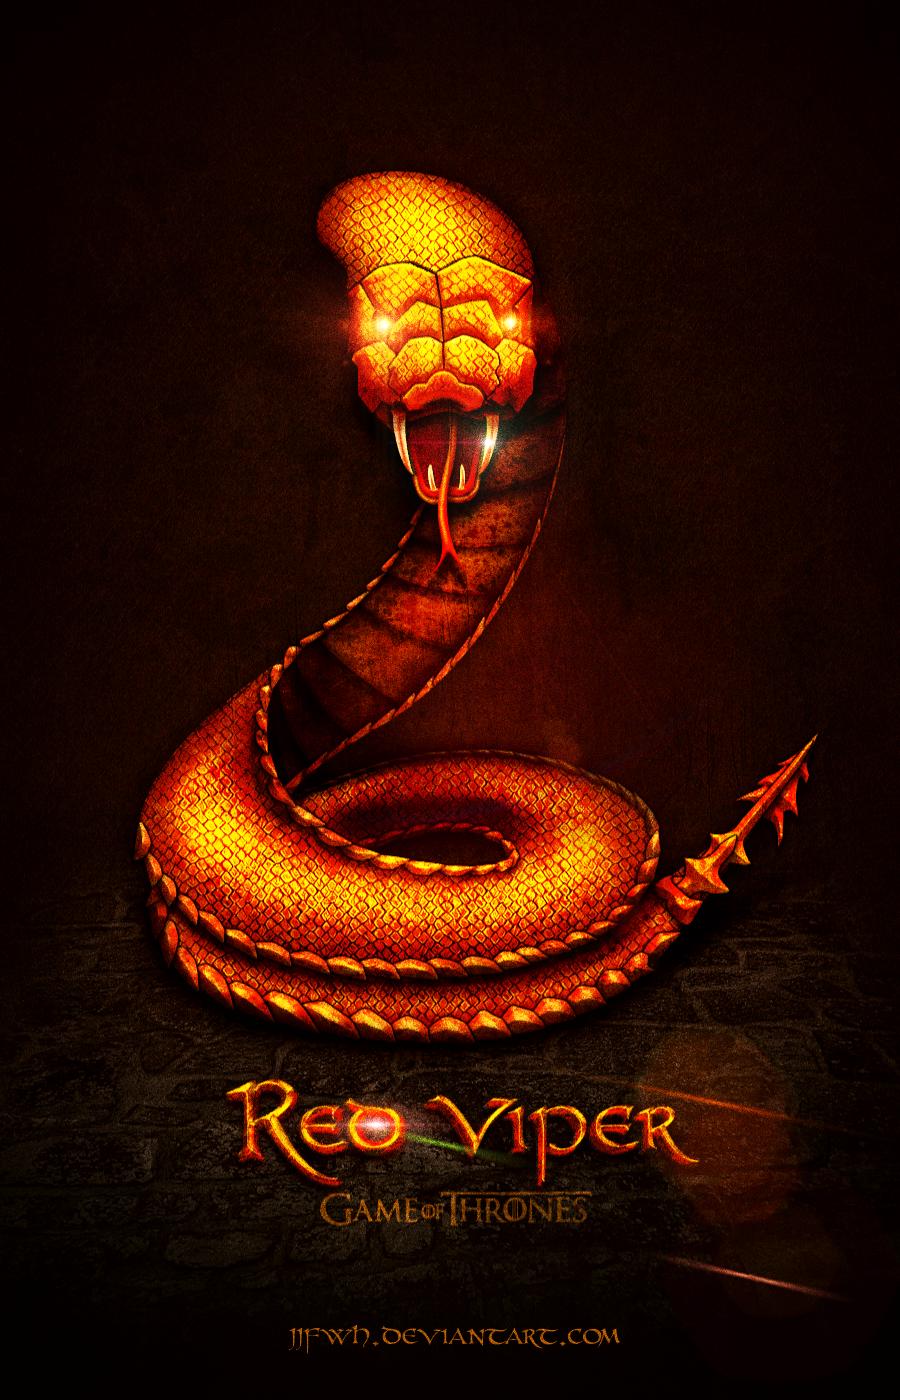 Red viper snake logo - photo#26